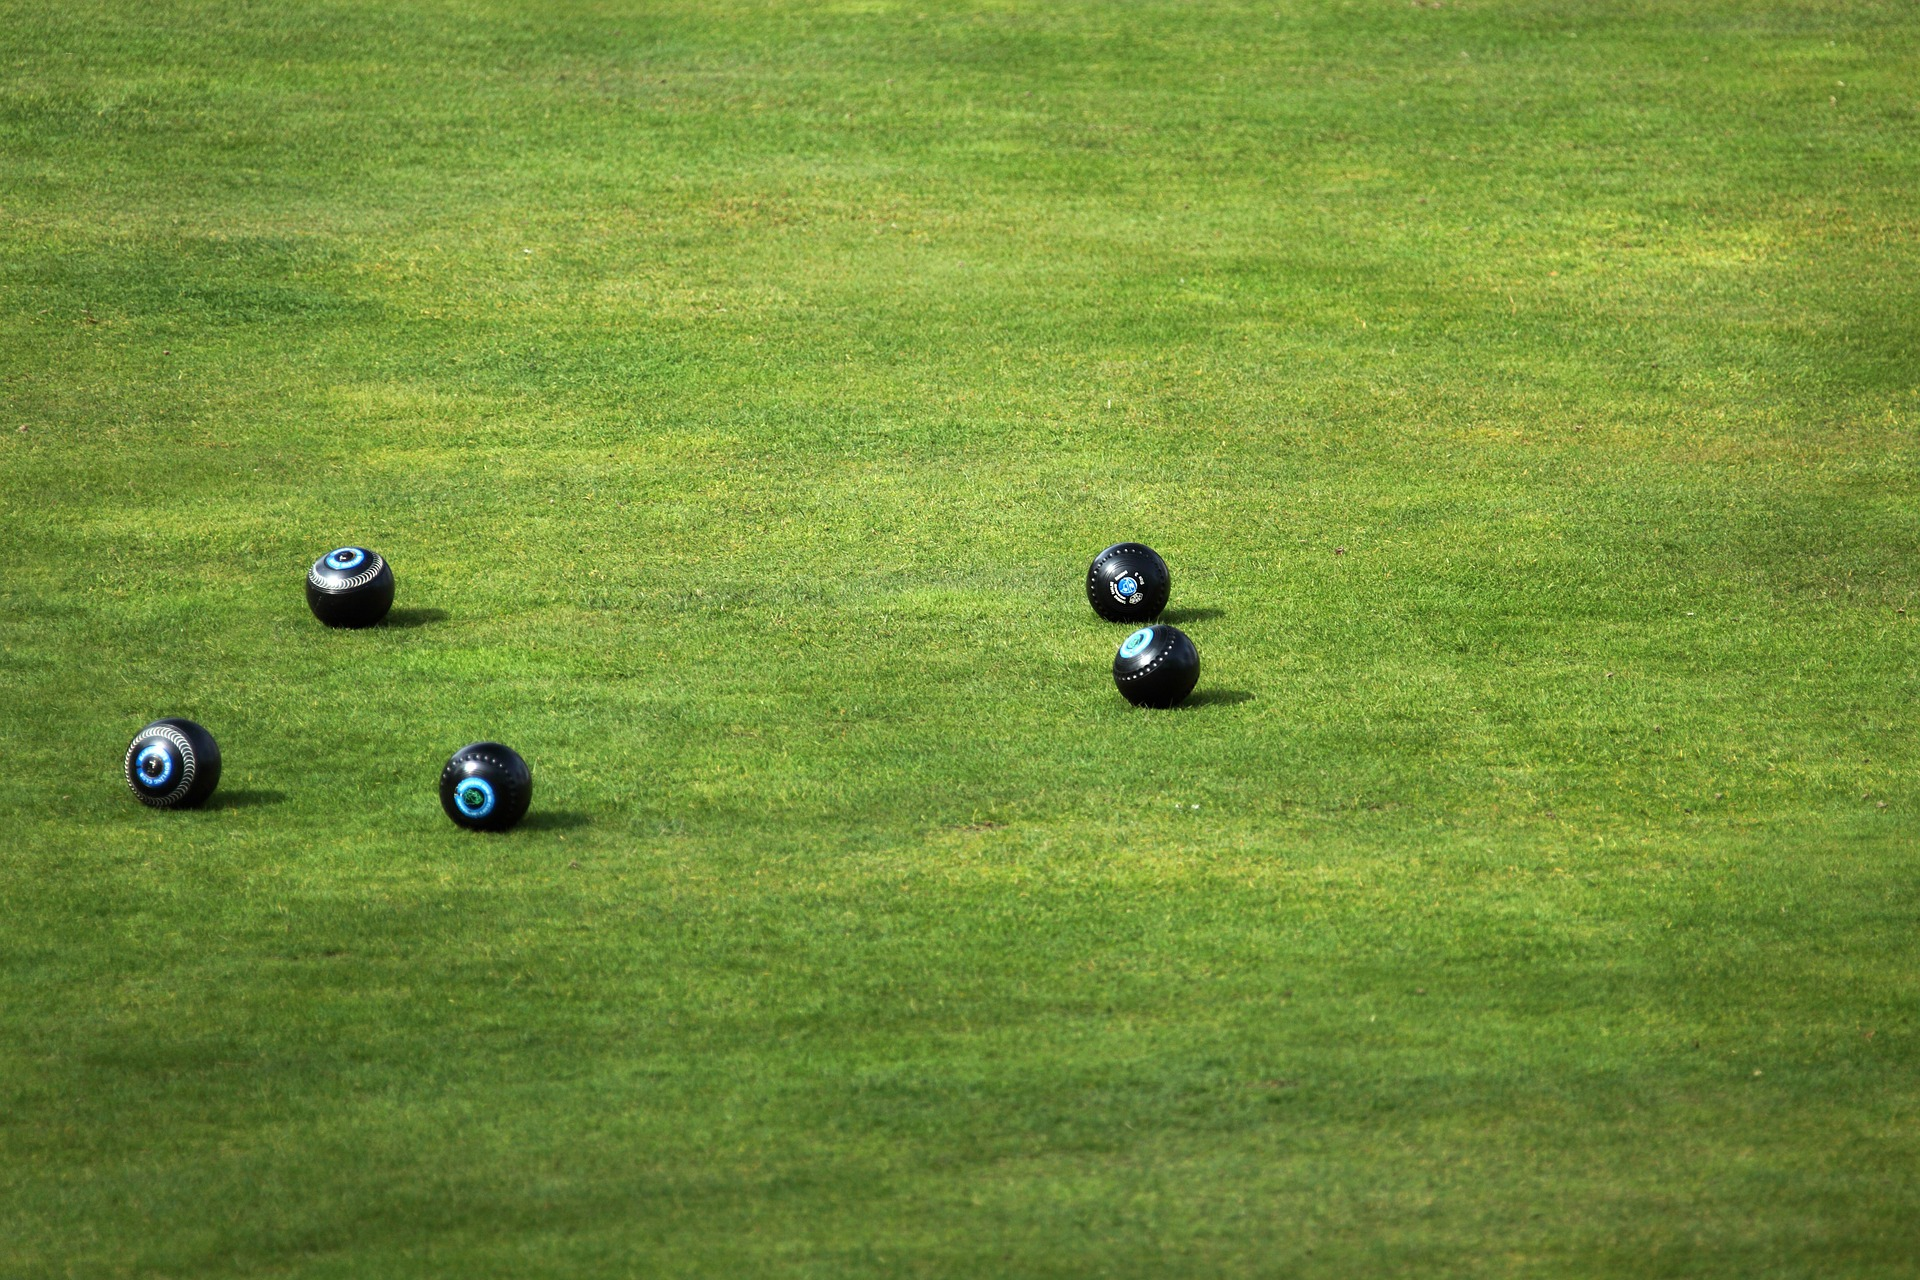 bowling_grn_pixabay_ftu.jpg